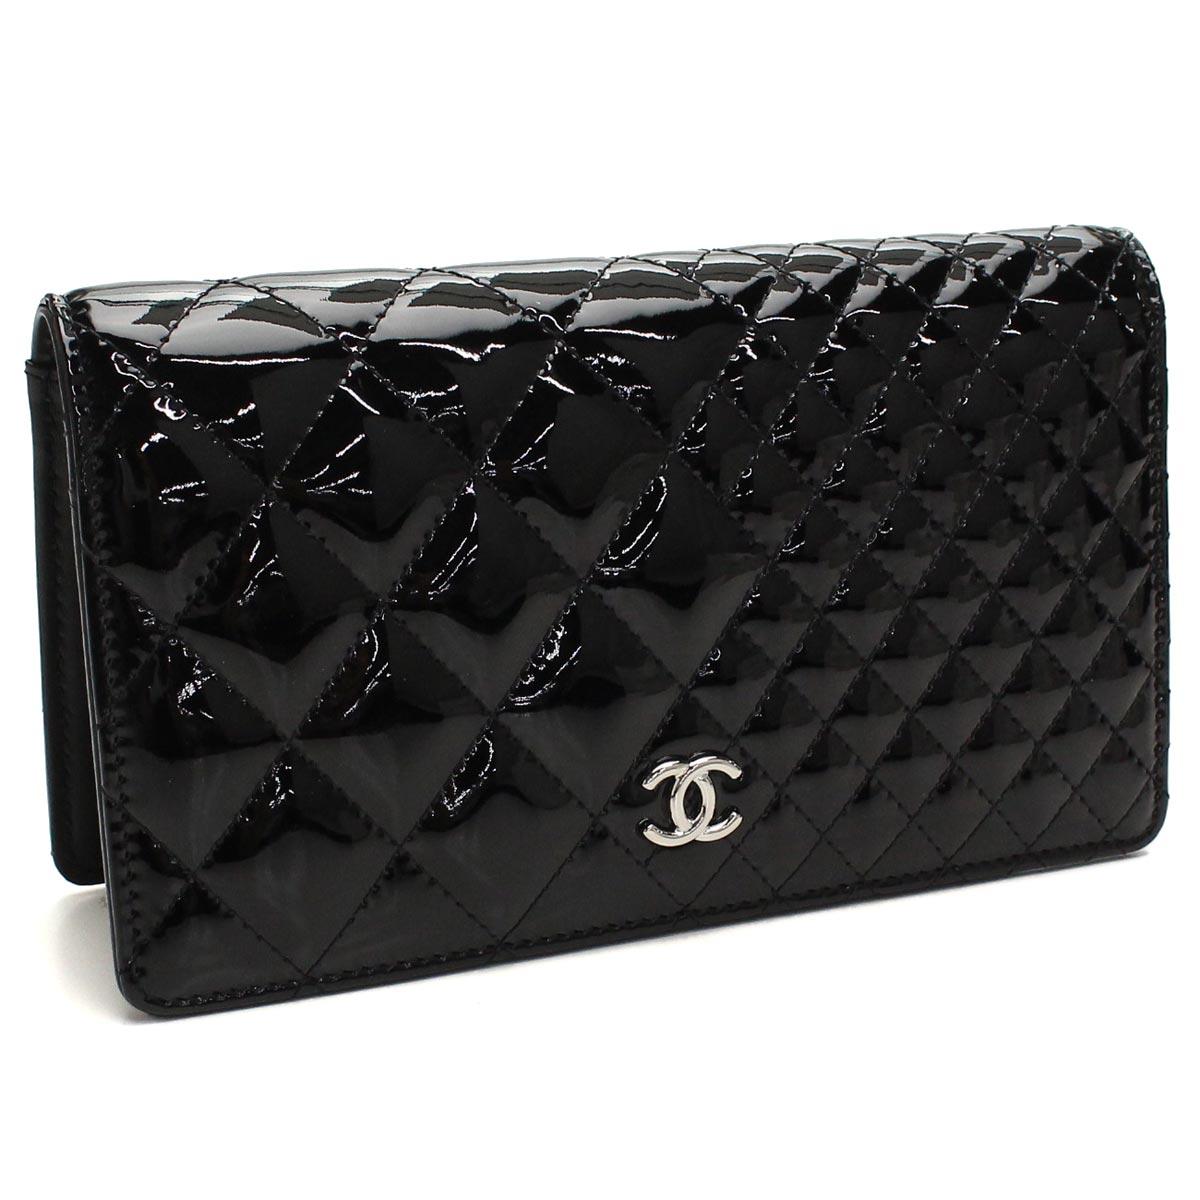 faa8caadc3ec Bighit The total brand wholesale: Chanel wallet bi-fold rubx A82518 black(  taxfree/send by EMS/authentic/A brand new item ) | Rakuten Global Market